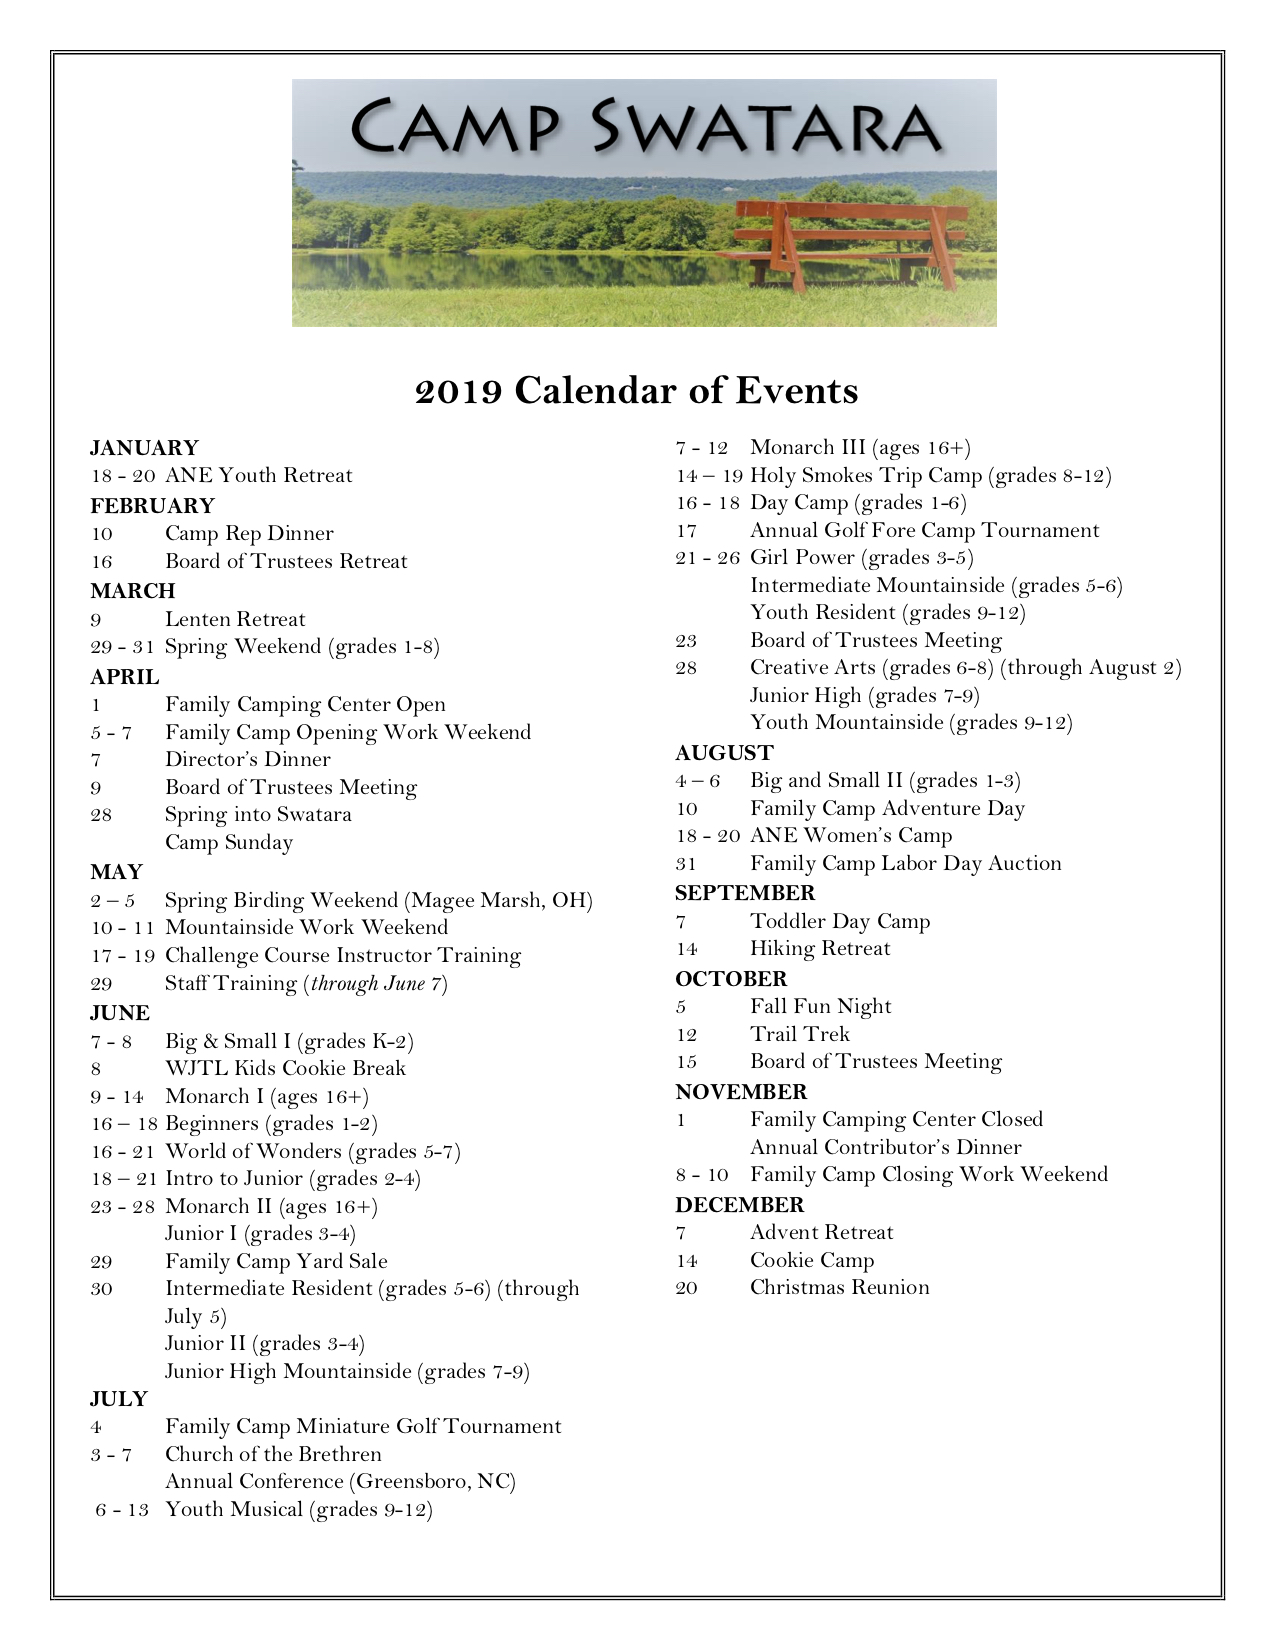 2019 Calendar of Events.jpg